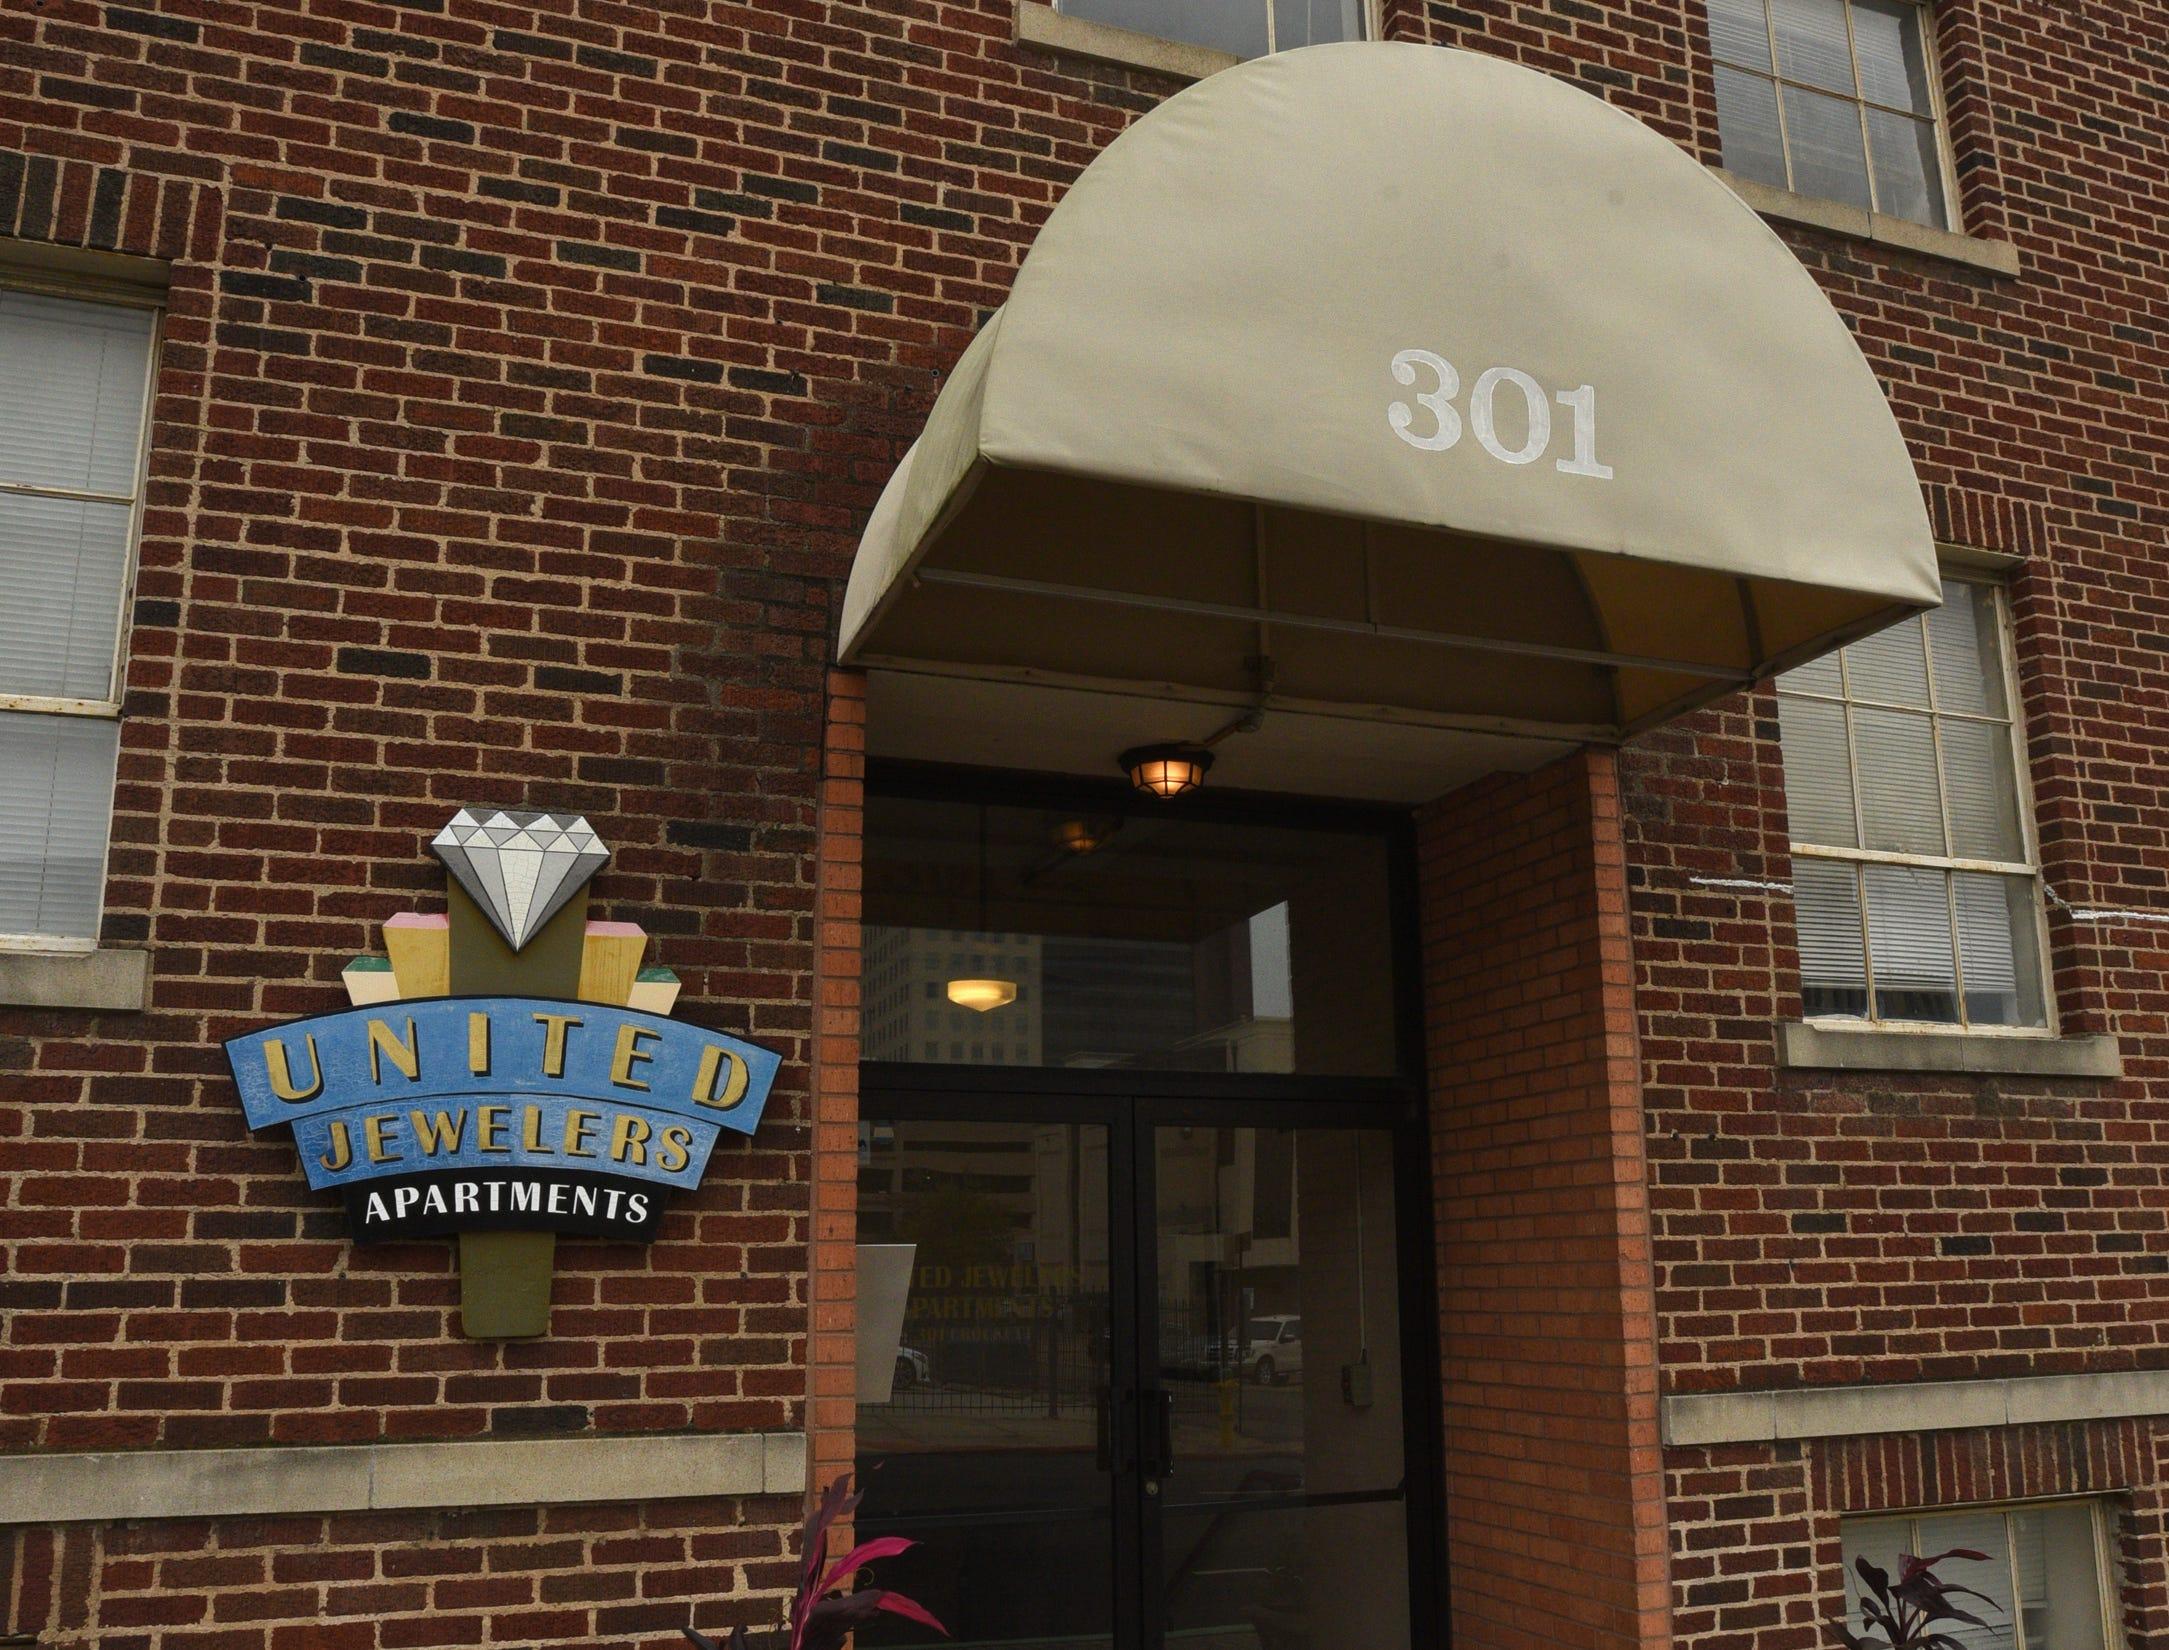 United Jewelers Apartments in Shreveport.